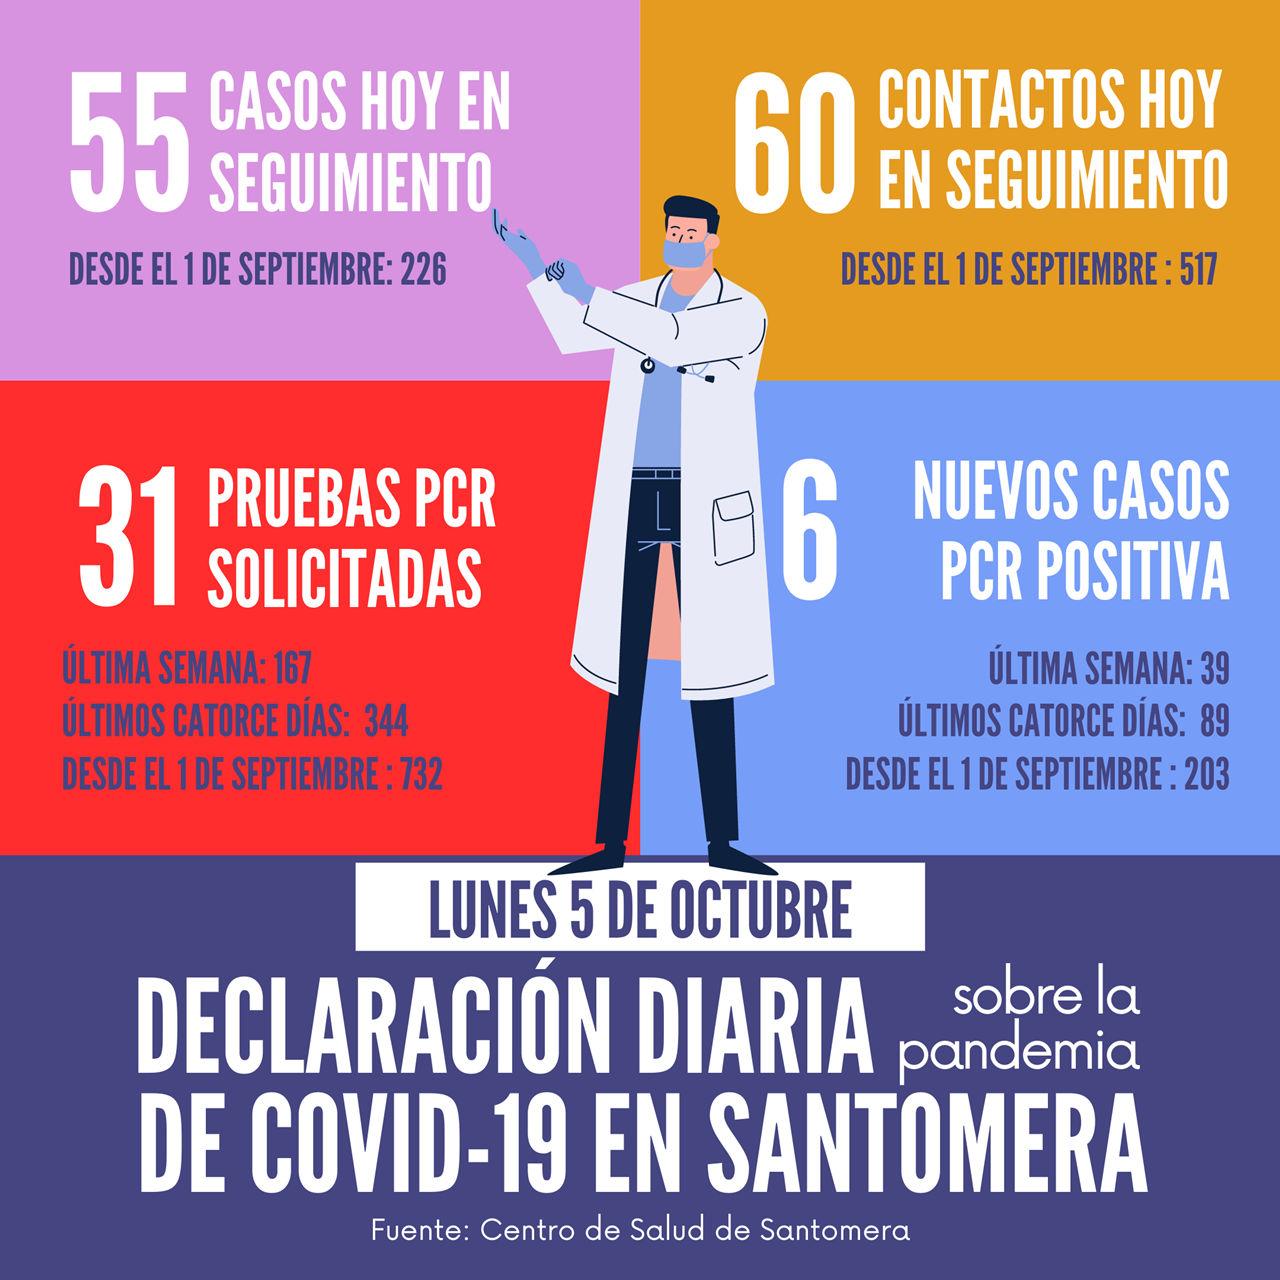 20201005_Datos COVID-19 Santomera